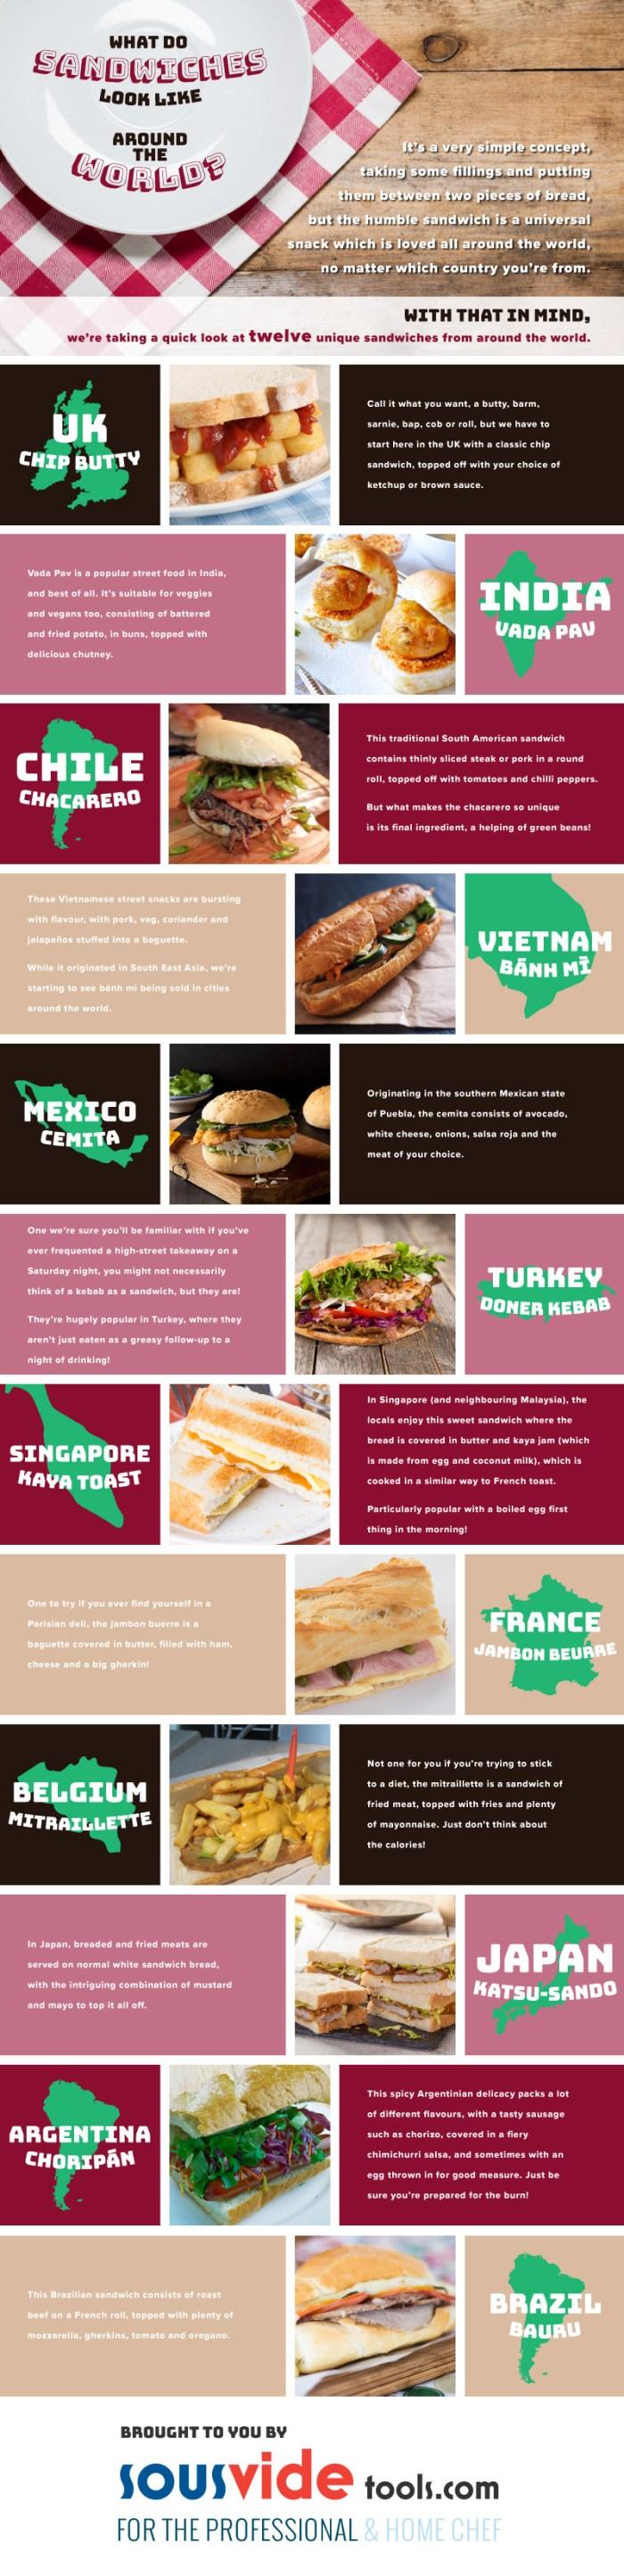 sandwiches around the world infographic